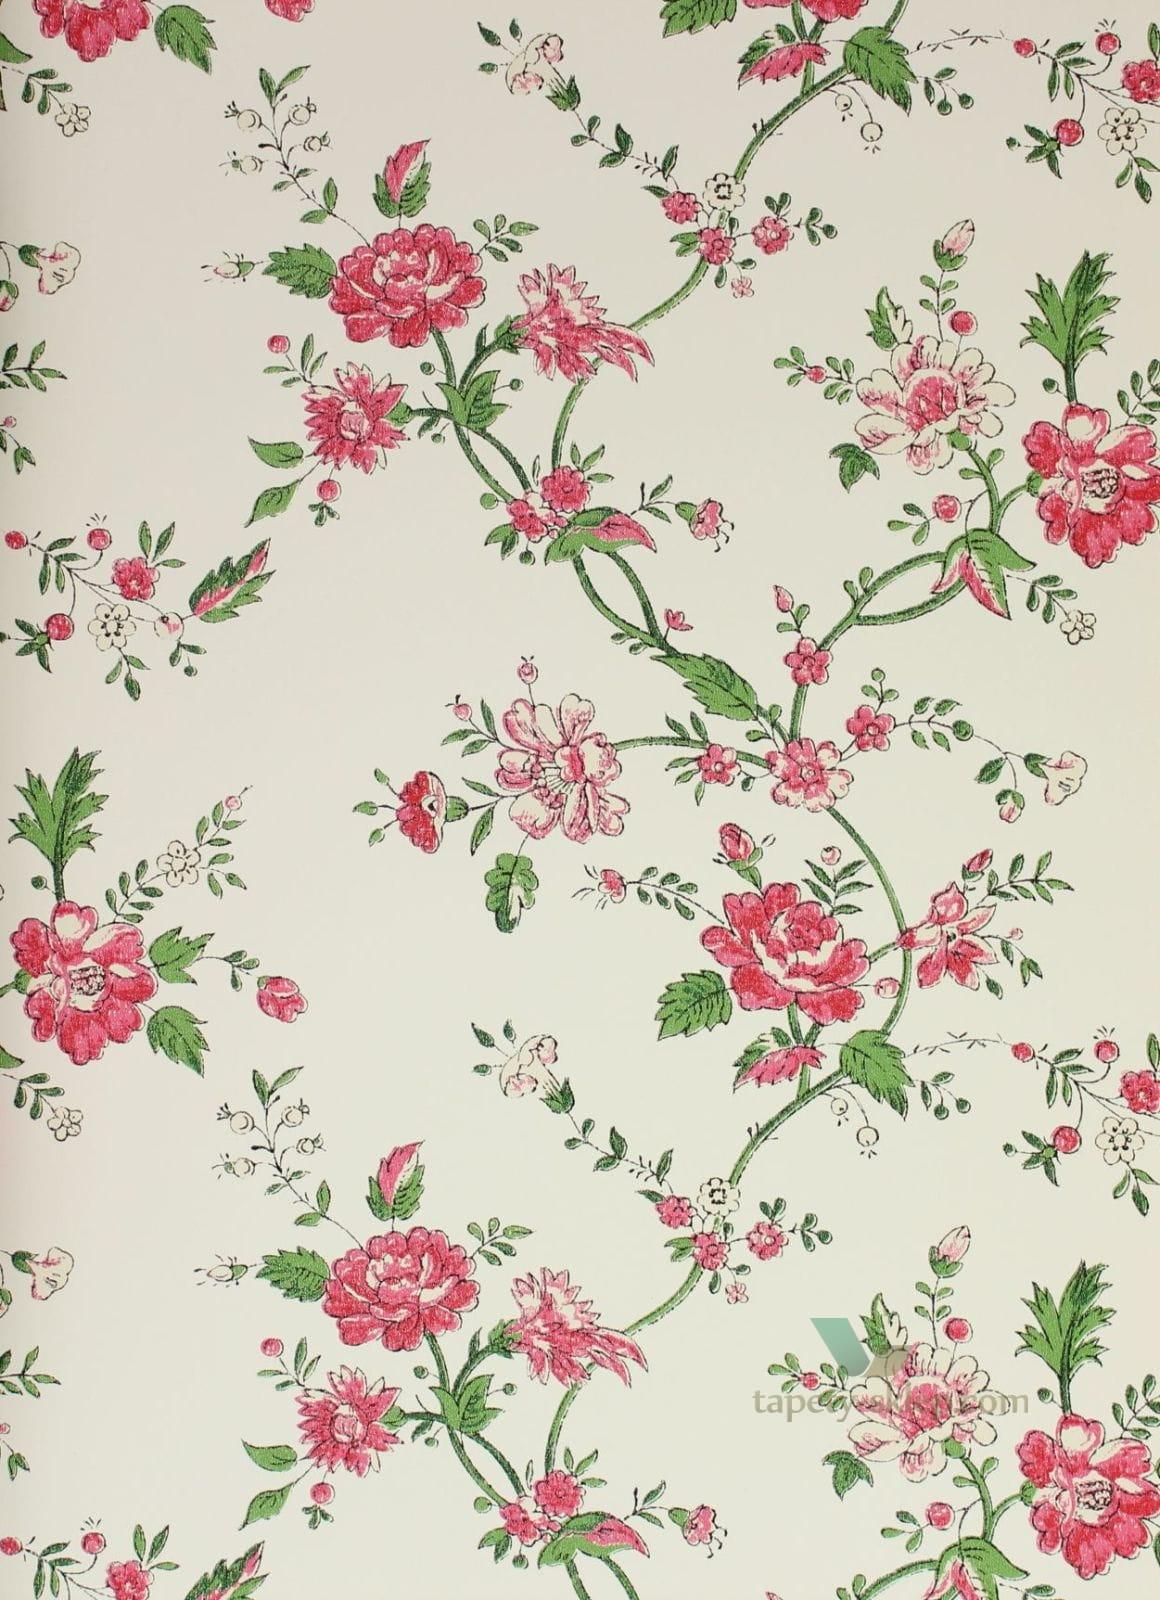 Tapeta w kwiaty Igone Bloomingdale 326128  Bloomingdale